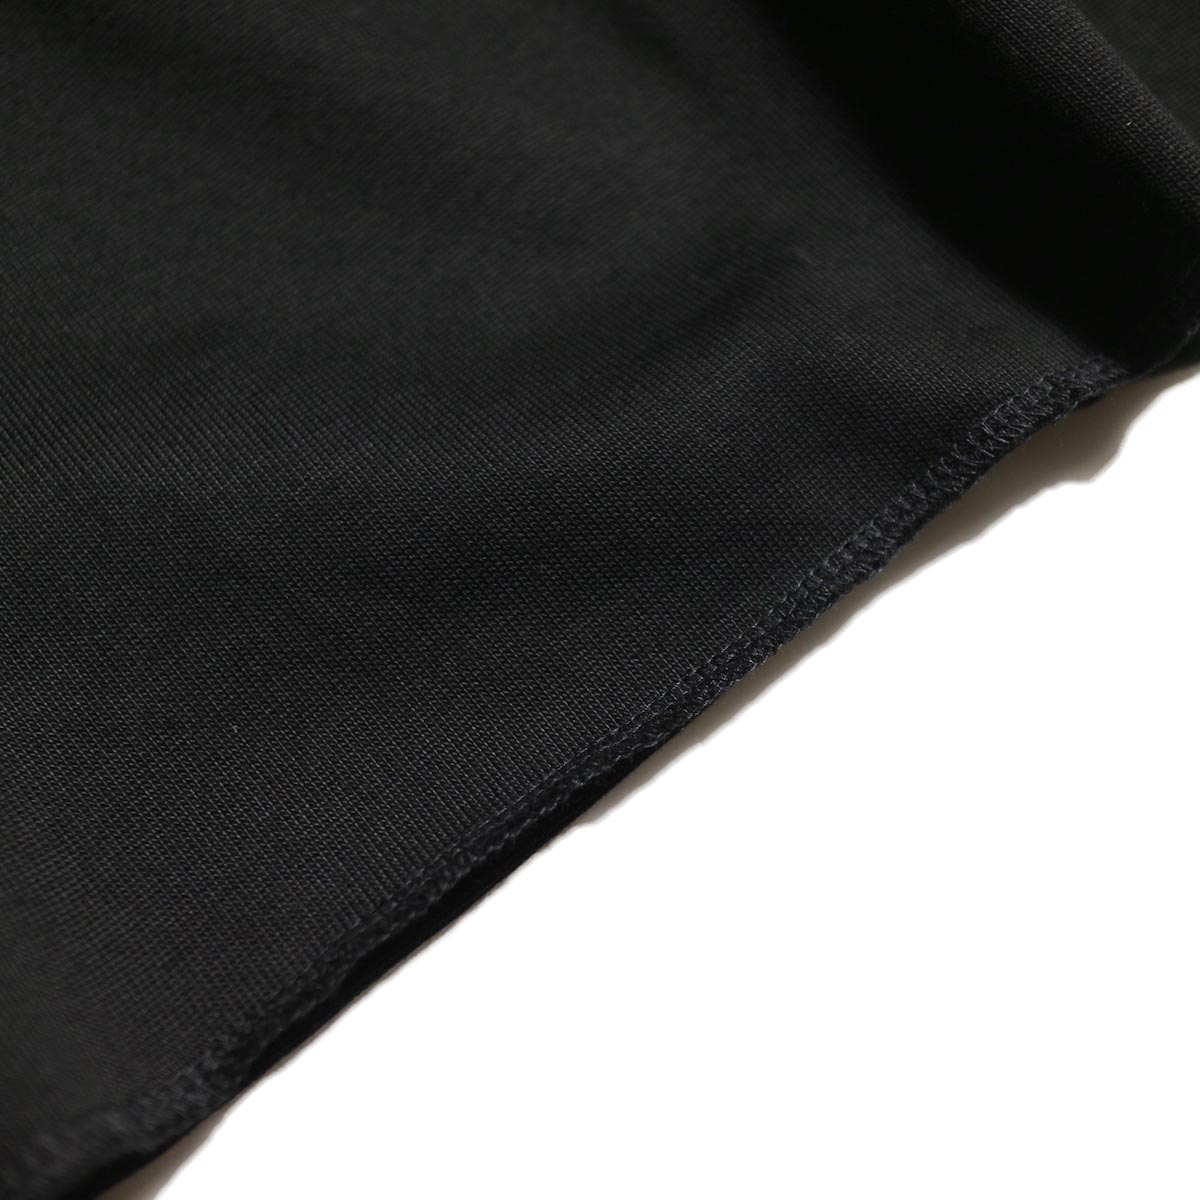 N.HOOLYWOOD / 1202-CS13-034 Big Tee (Black)裾